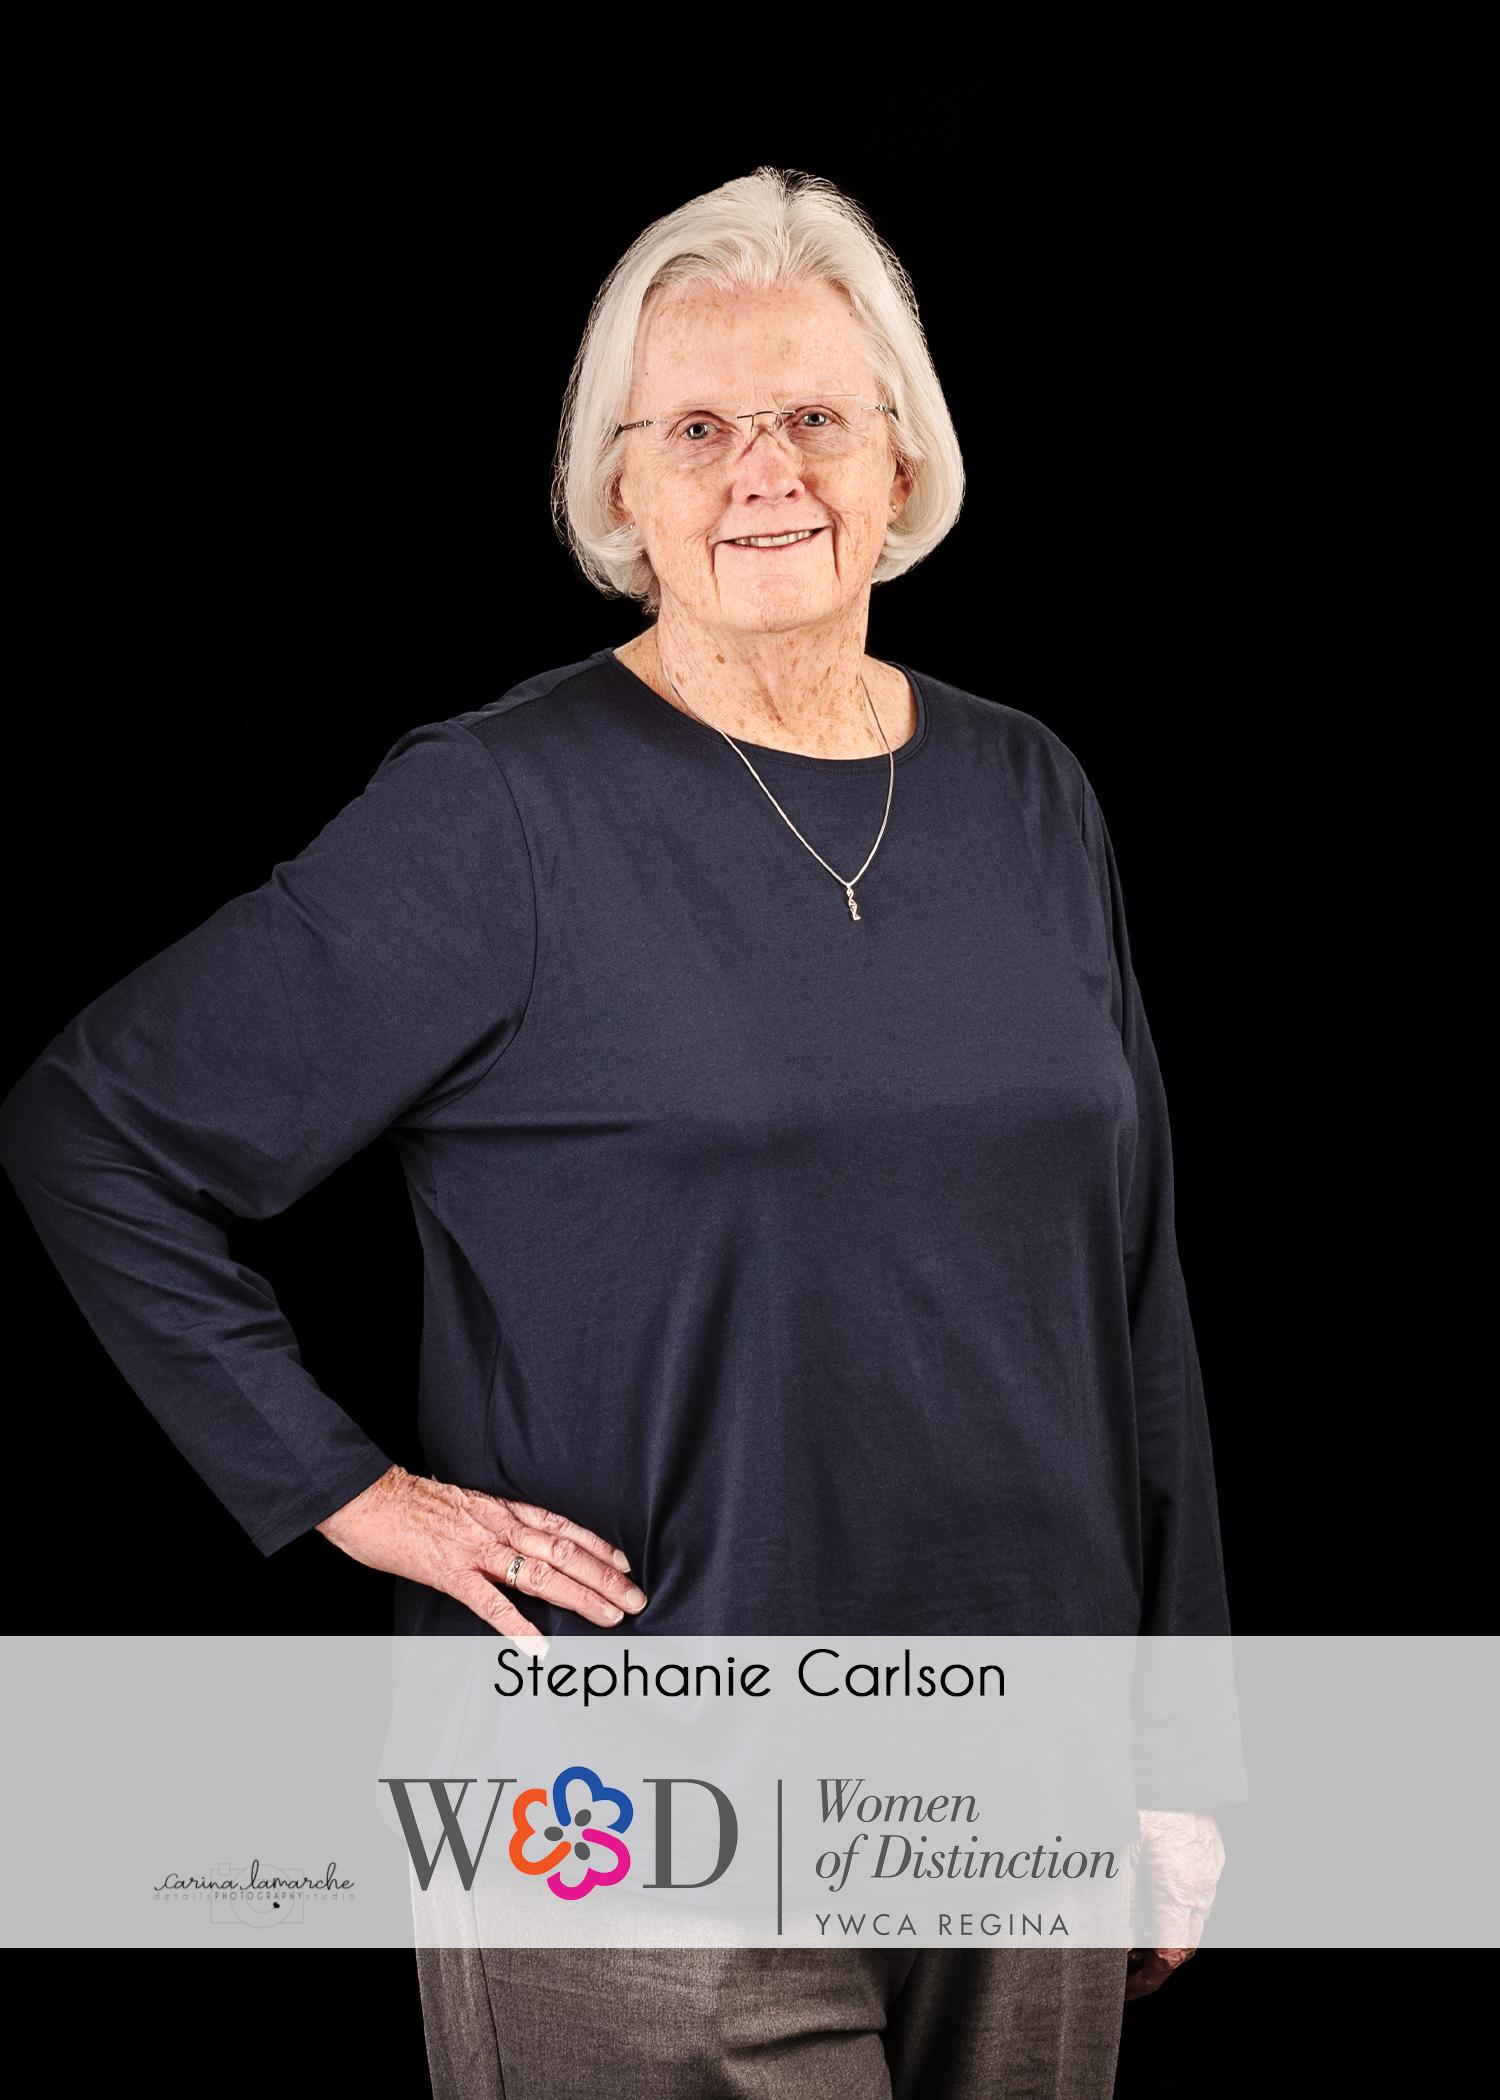 2019_065_Stephanie_Carlson_5x7.1.jpg